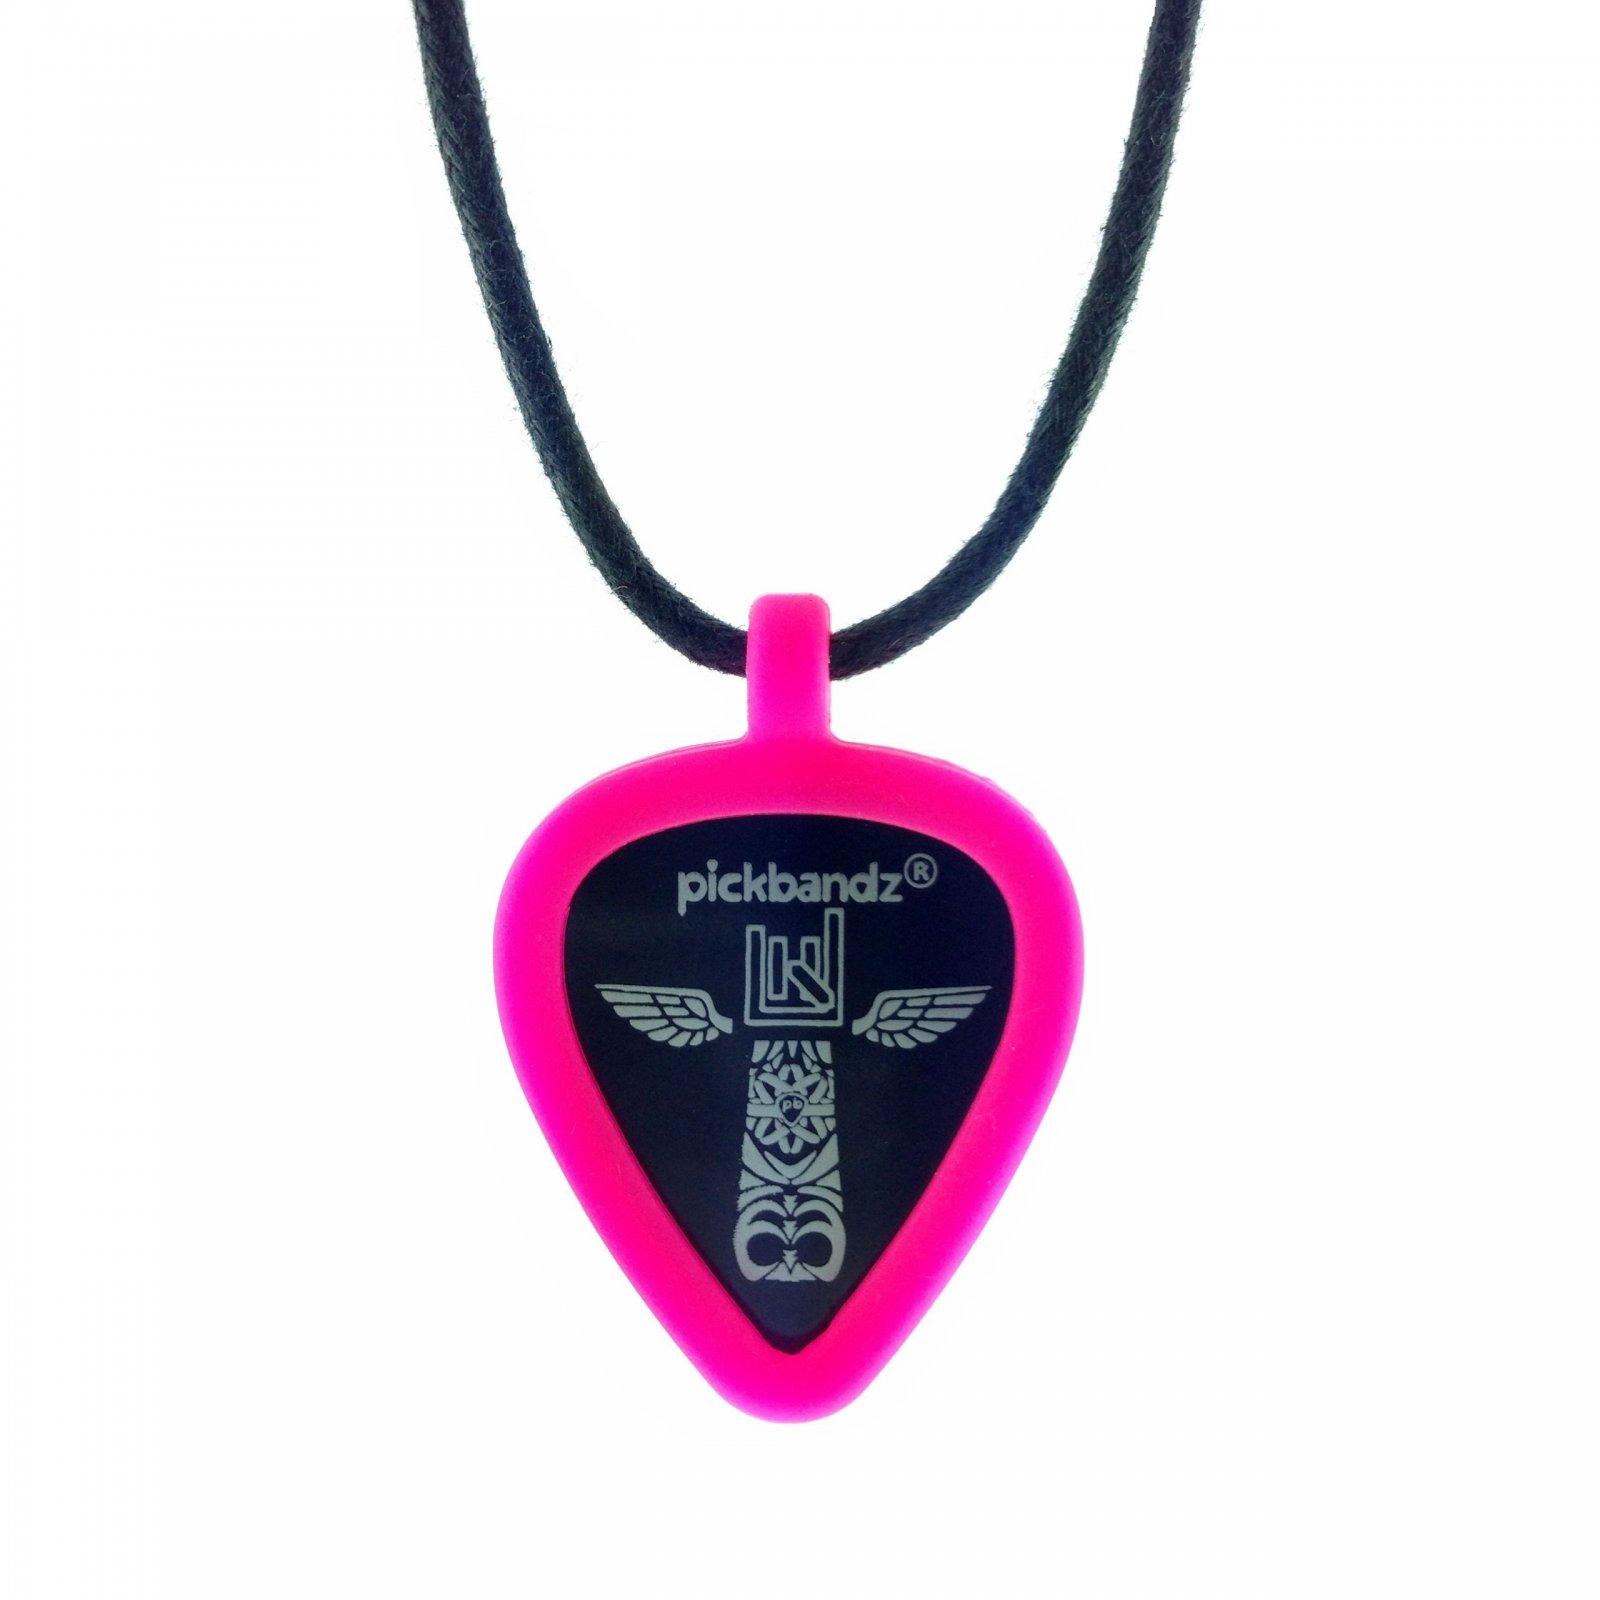 Pickbandz Hollywood Pink Necklace